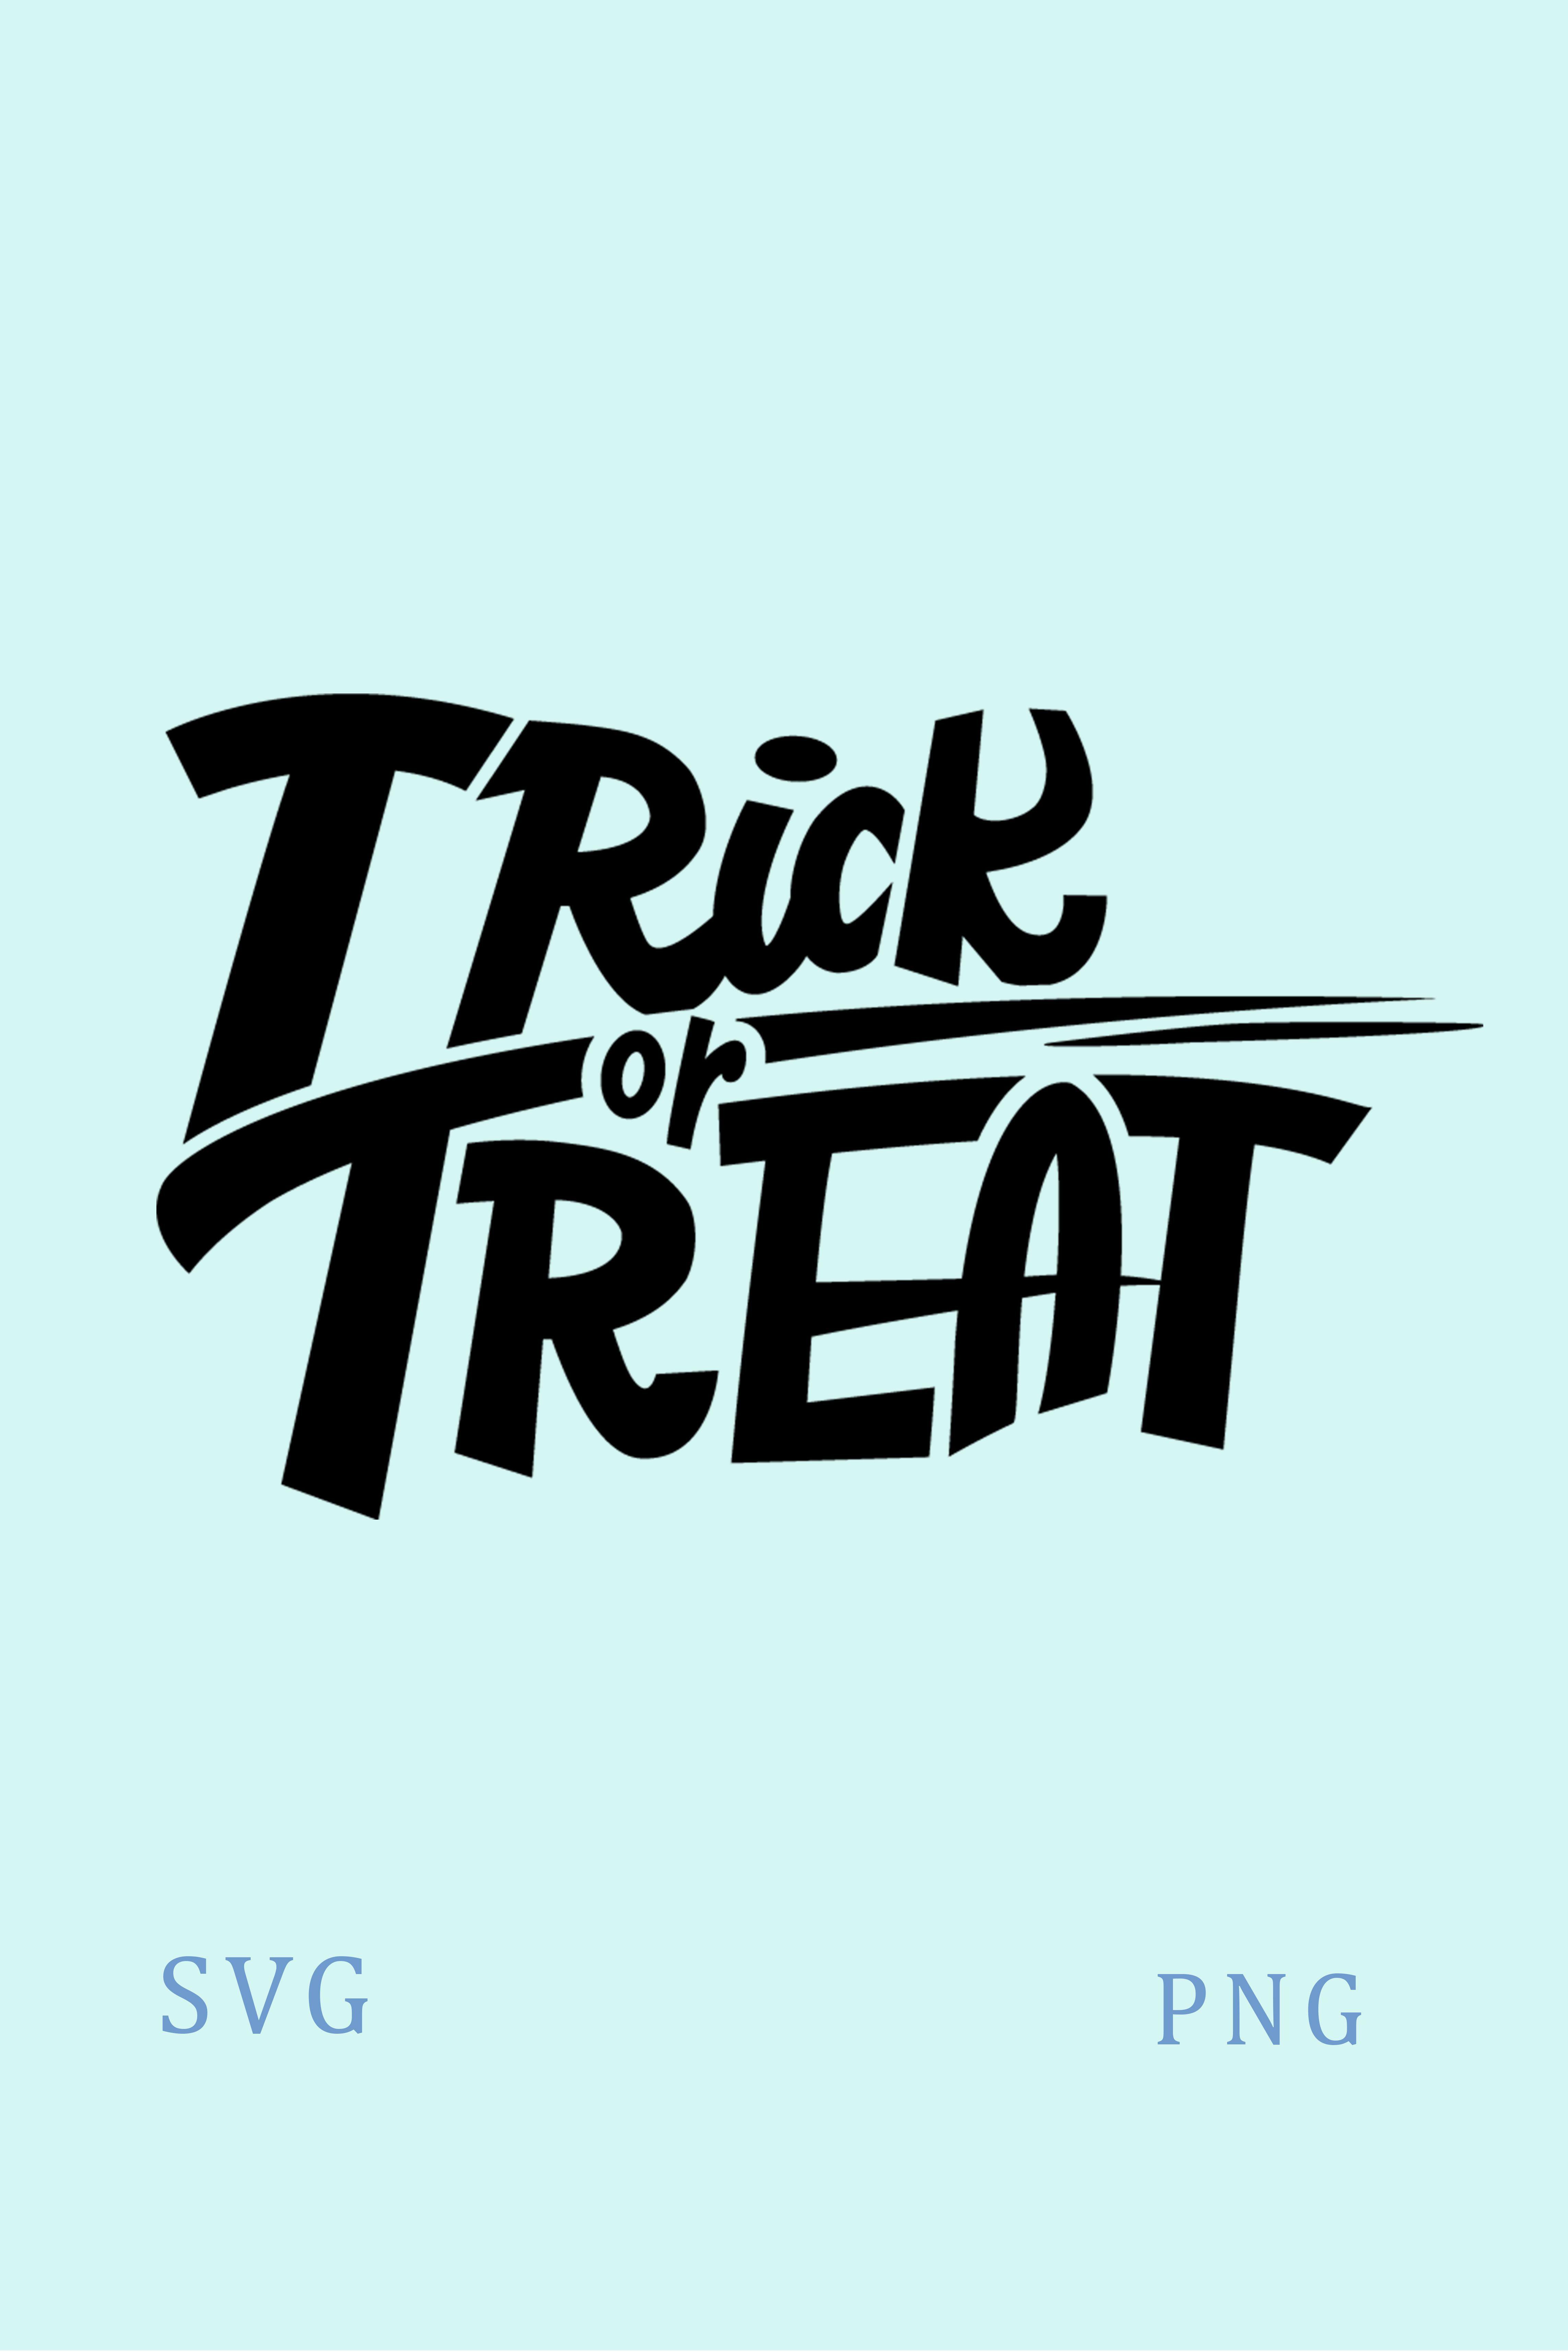 Trick Or Treat Svg Trick Or Treat Clipart Halloween Svg Clip Art Bat Svg Instant Download Programingsoftware Trick Or Treat Trick Or Treat Svg Trick Or